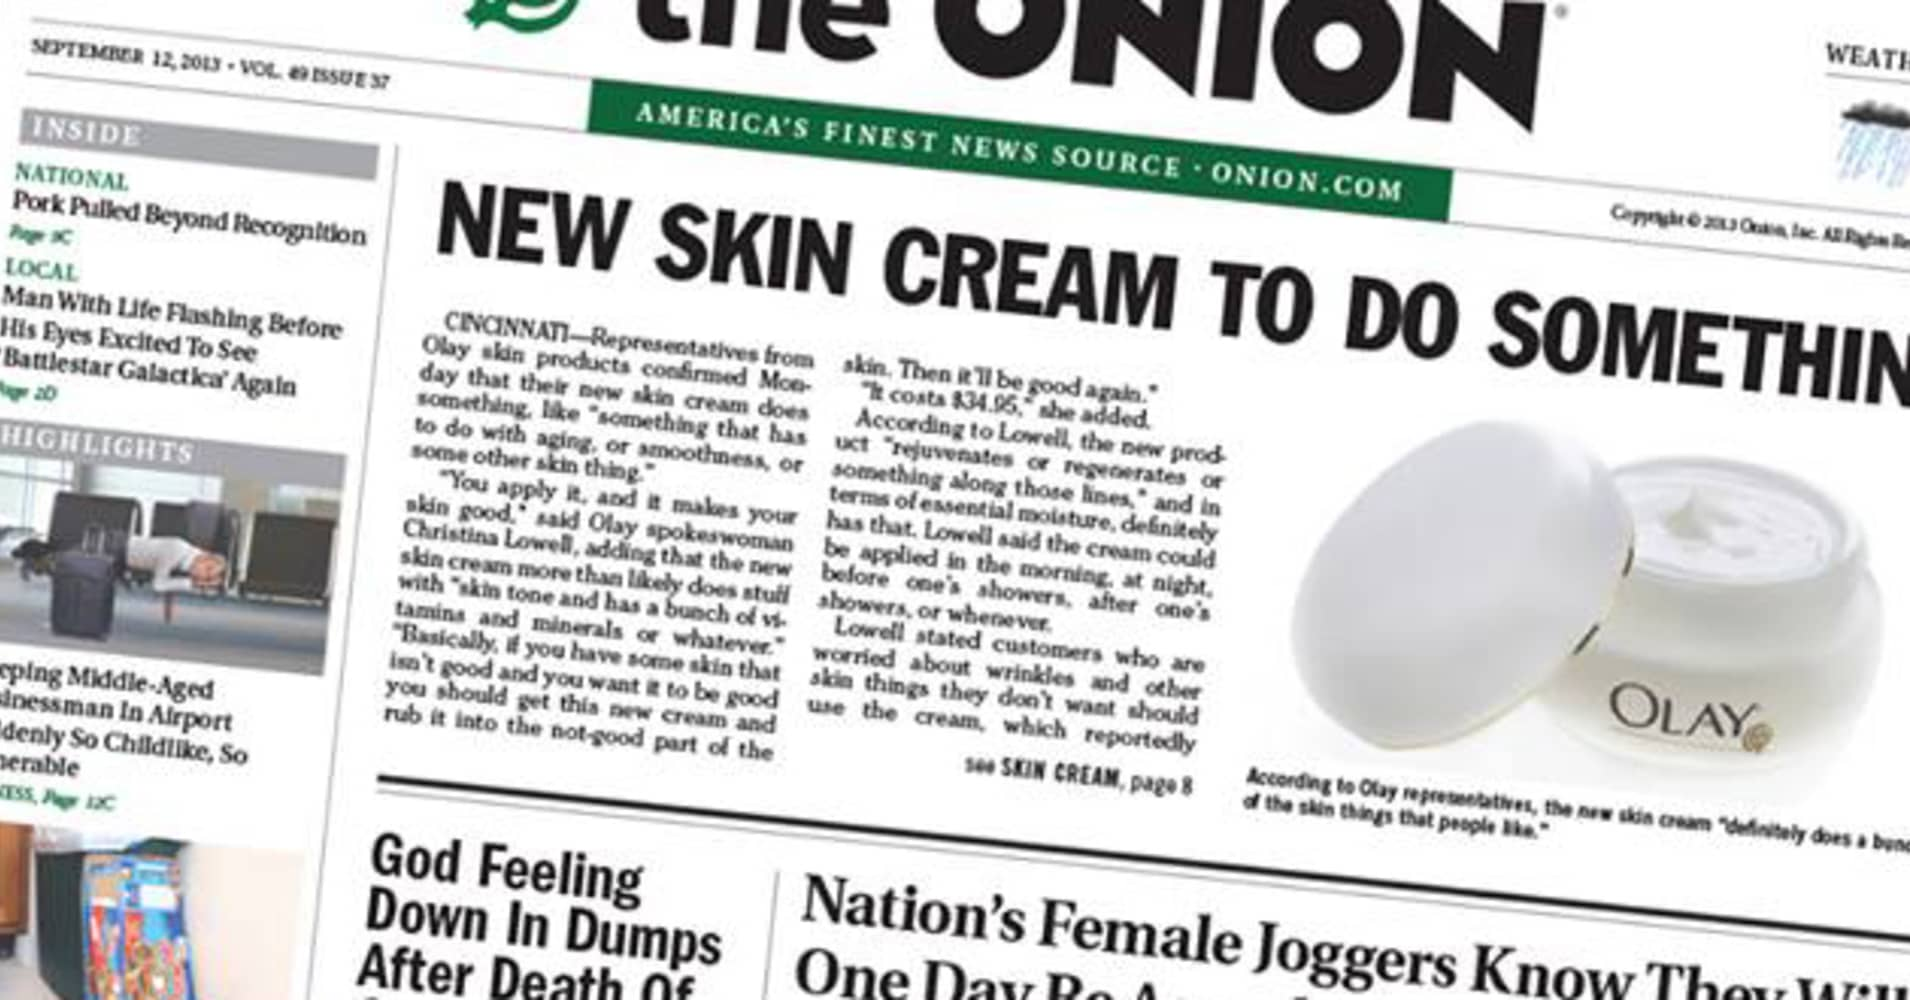 The onion cryptocurrency headline